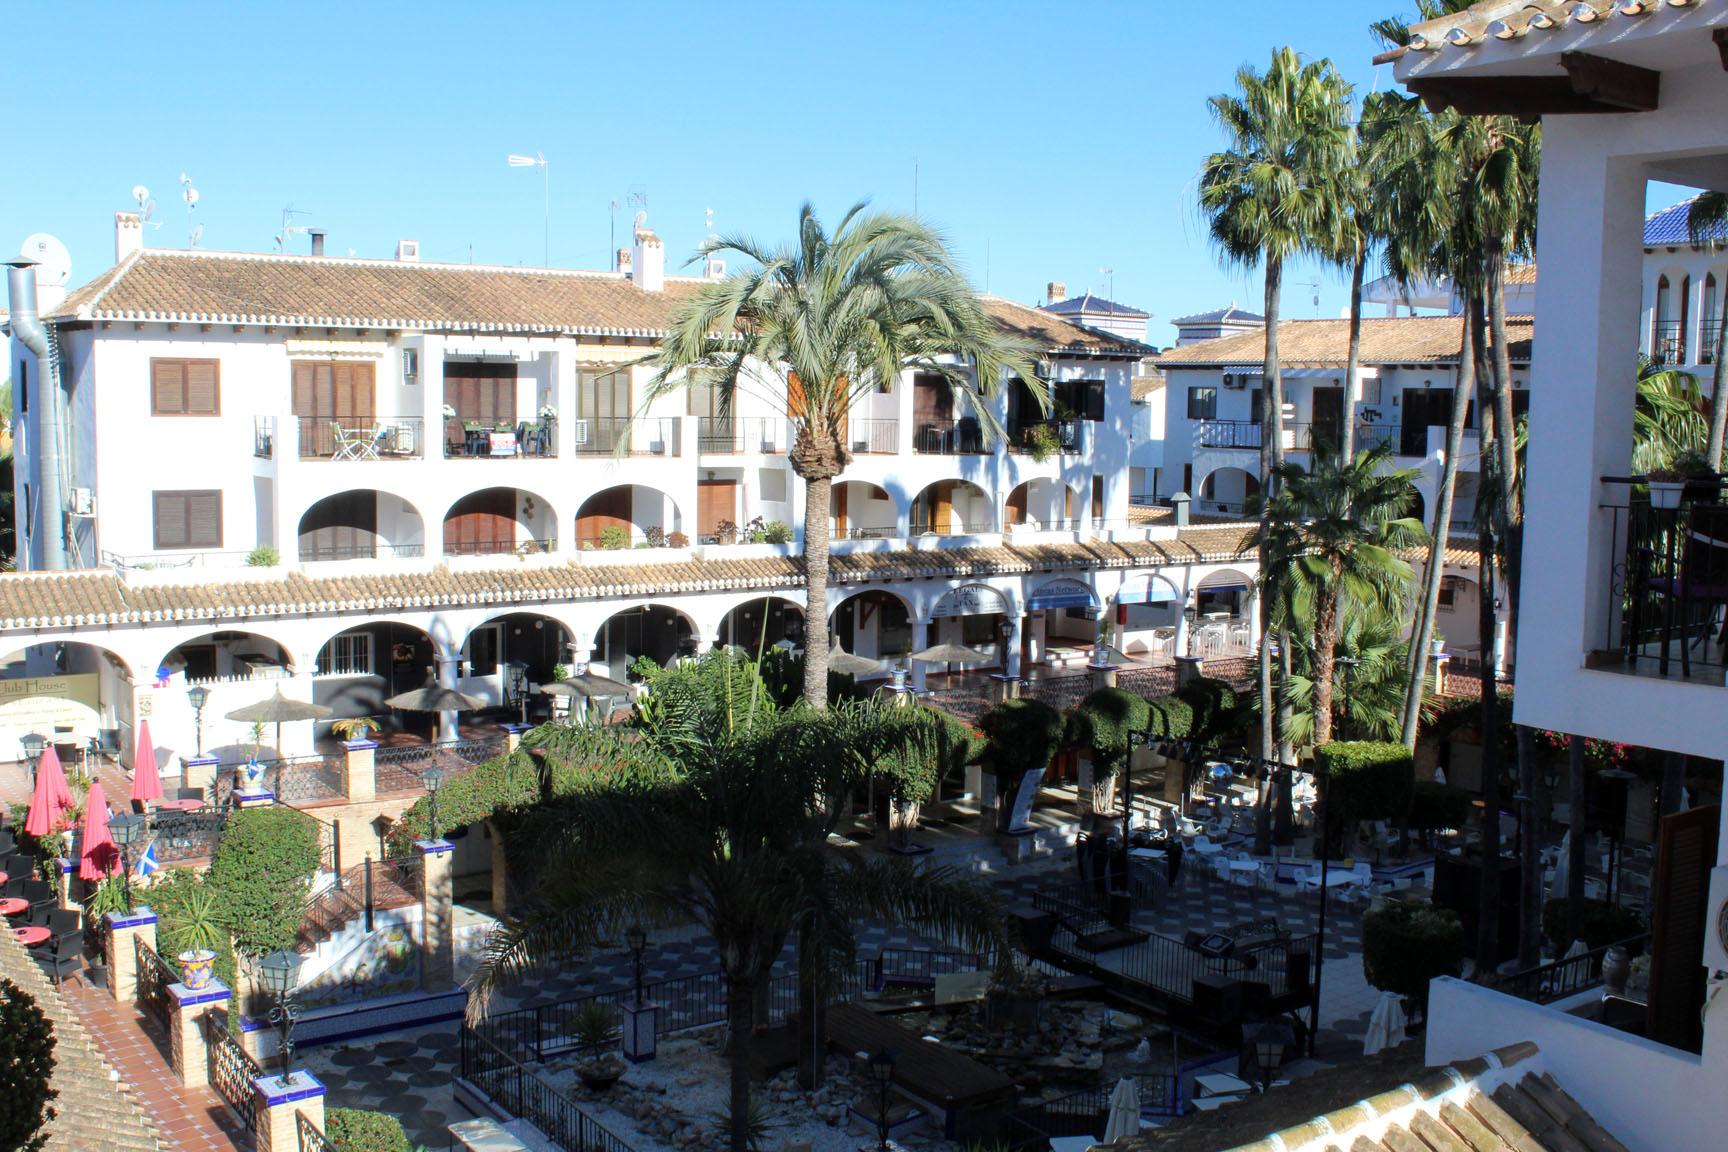 ITSH Property Views into the Villamartin Plaza 1